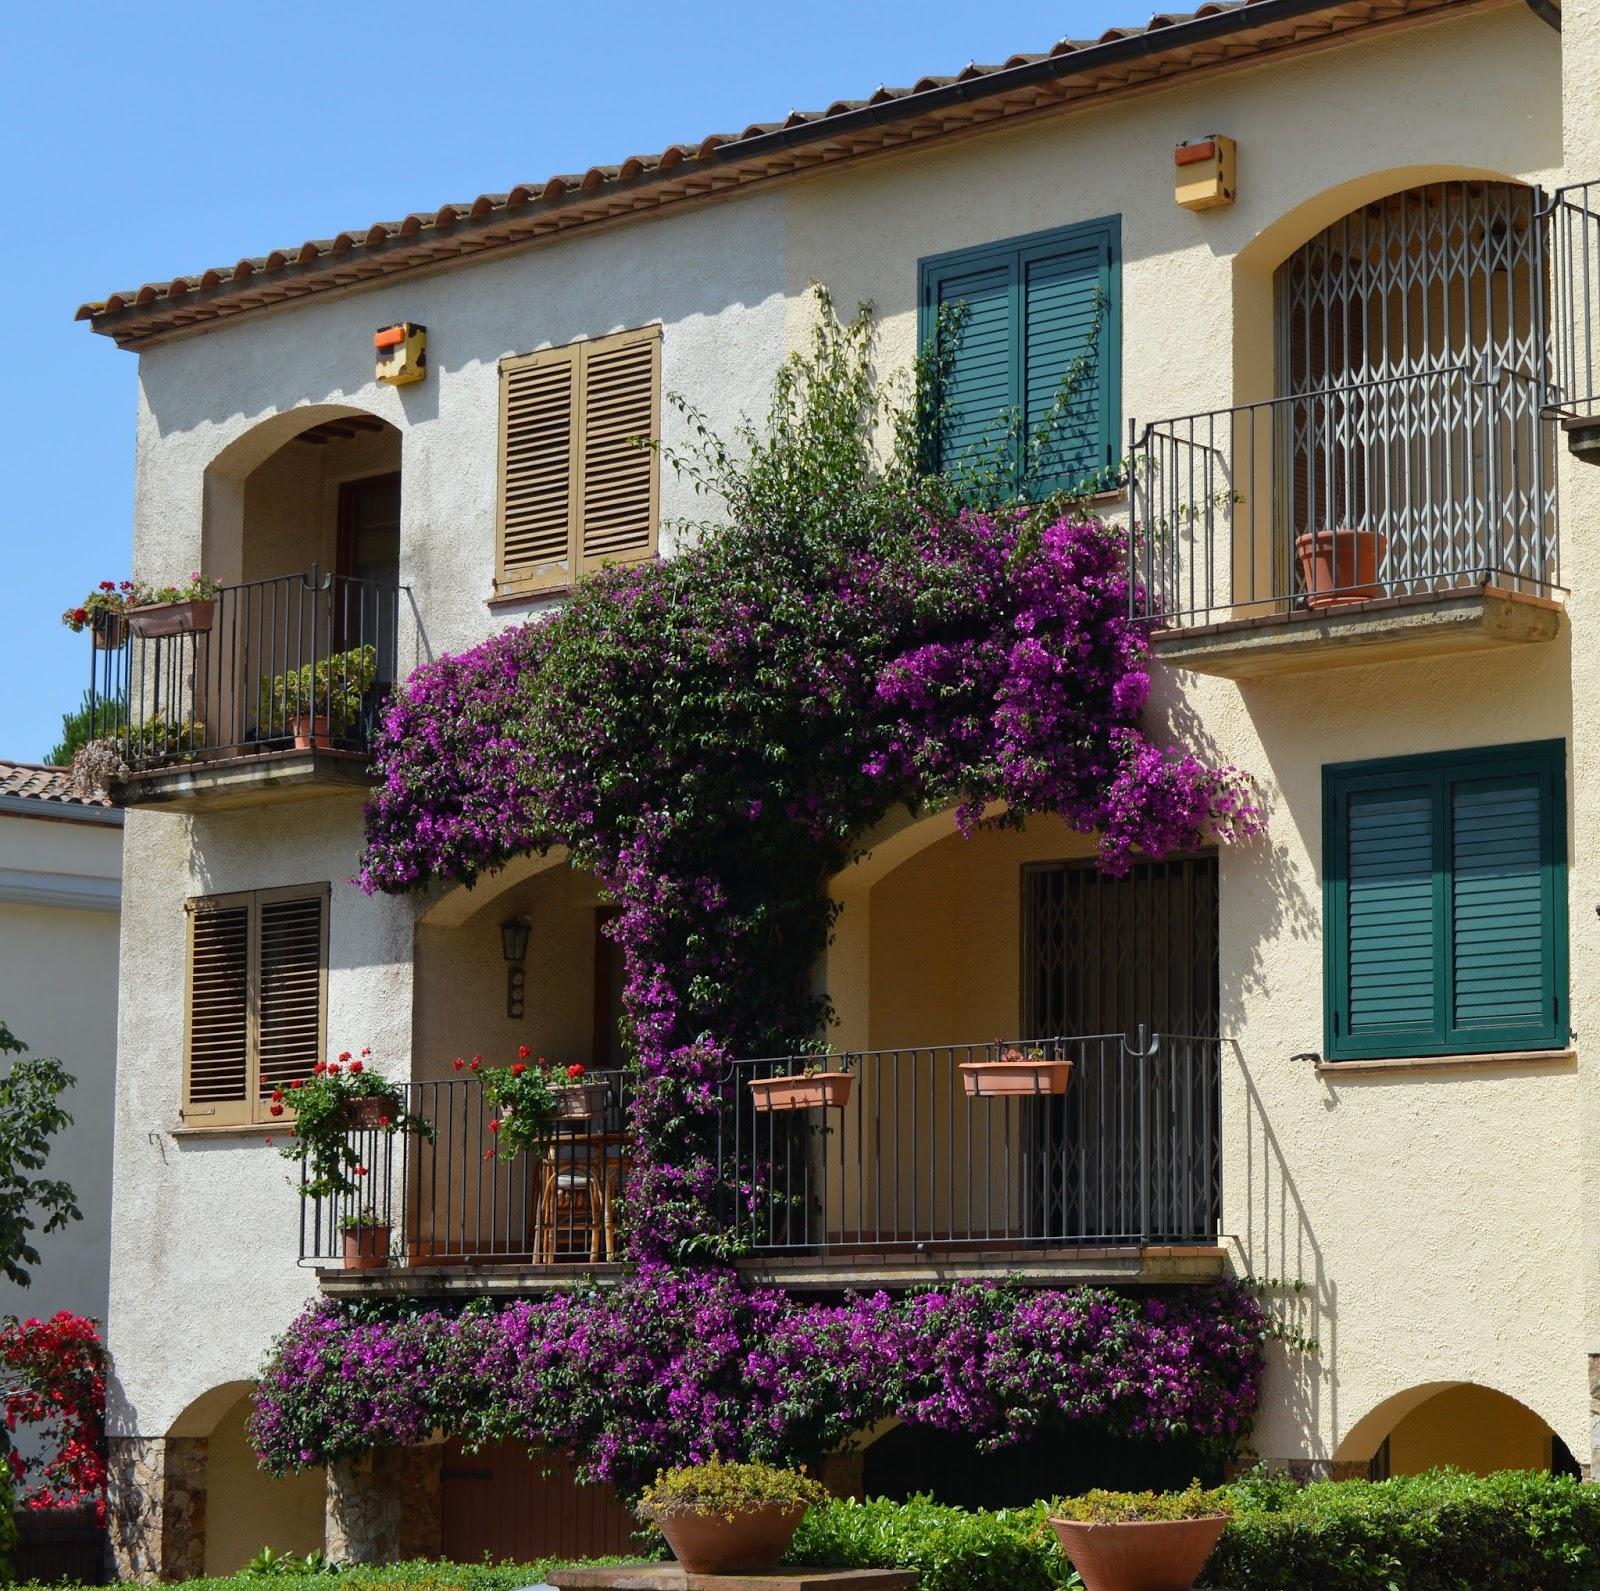 The beautiful coastal town of Calella de Palafrugell